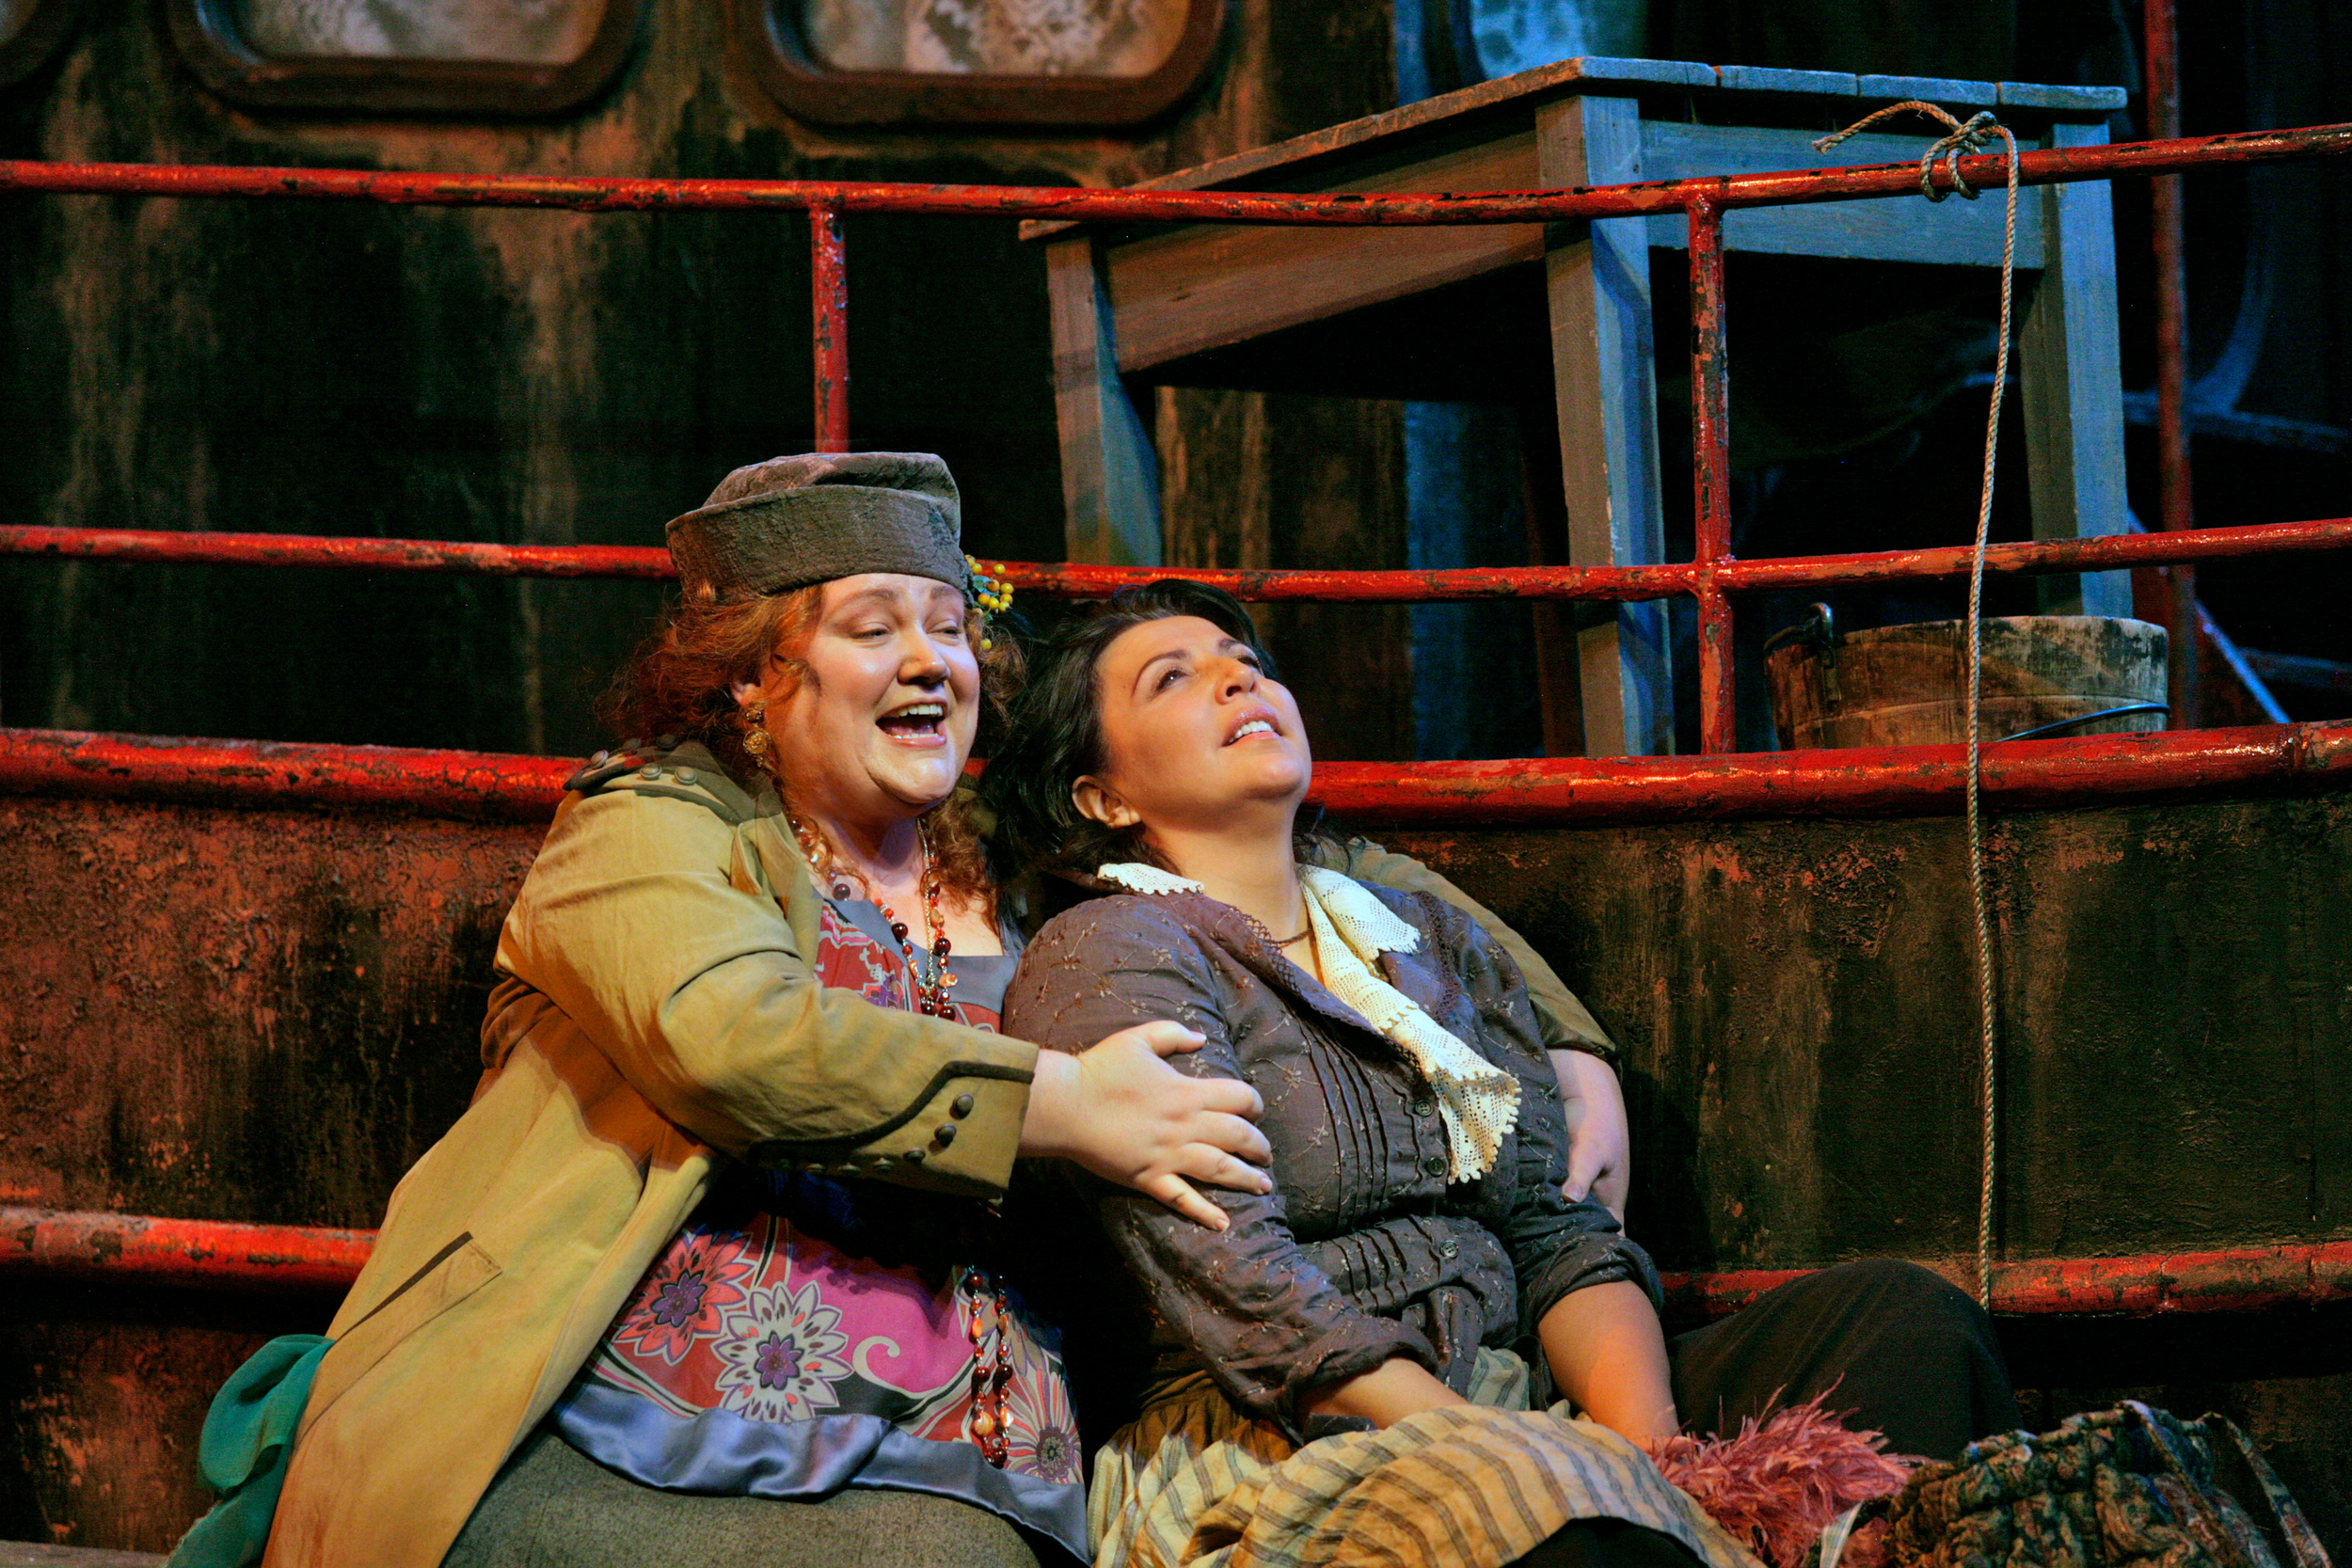 Il Tabarro, Metropolitan Opera